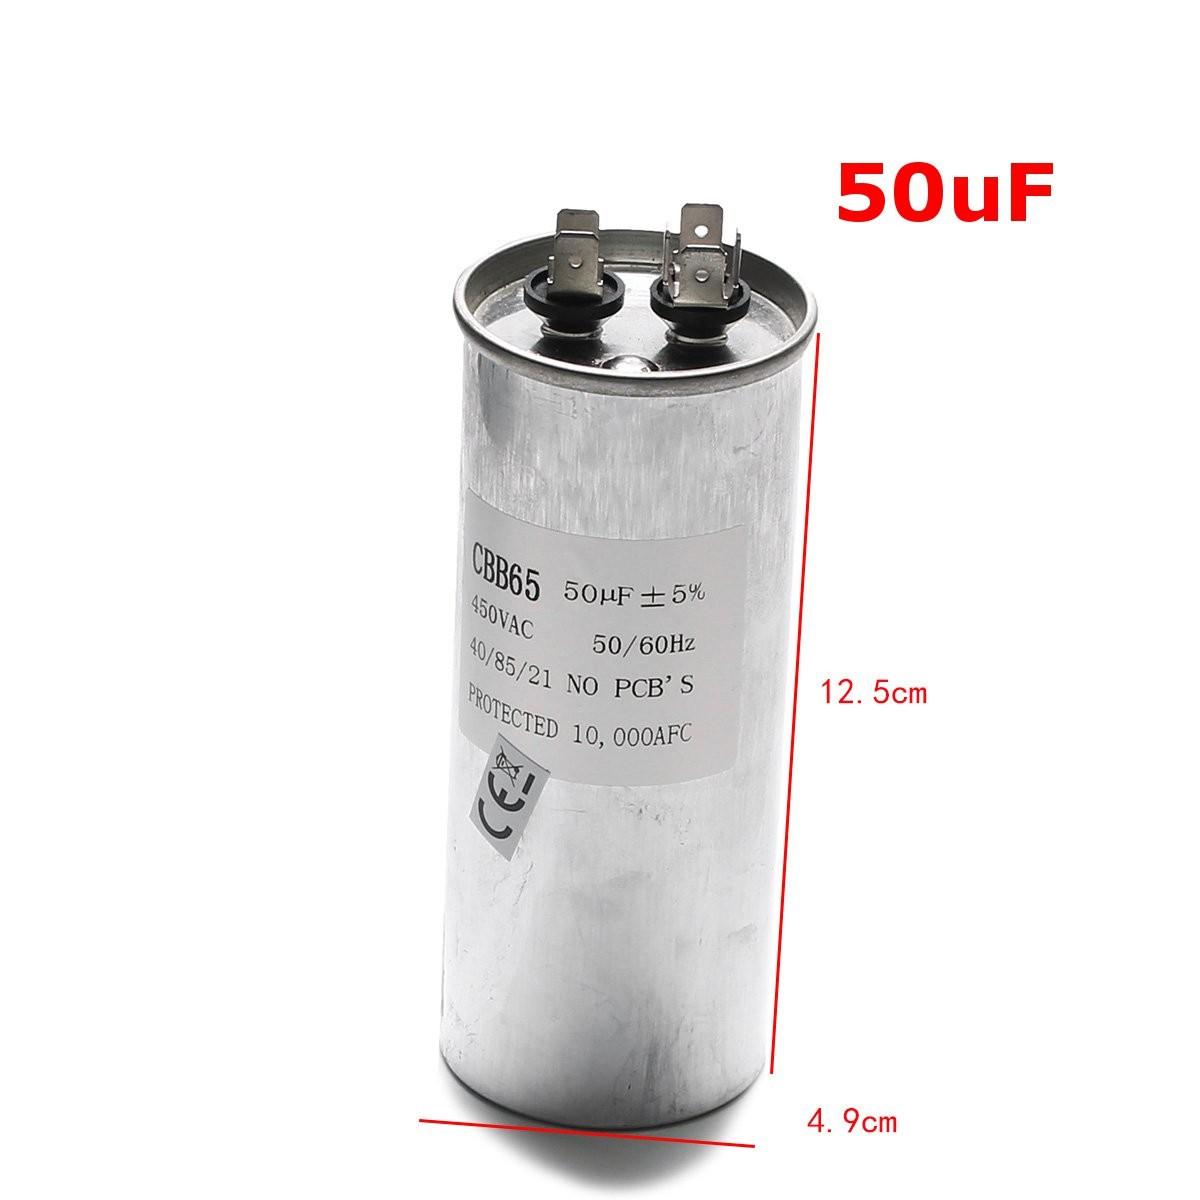 1550uf Motor Capacitor Cbb65 450vac Air Conditioner Pressor. 1550uf Motor Capacitor Cbb65 450vac Air Conditioner Pressor Start. Wiring. Cbb65a Capacitor Wire Diagram At Scoala.co